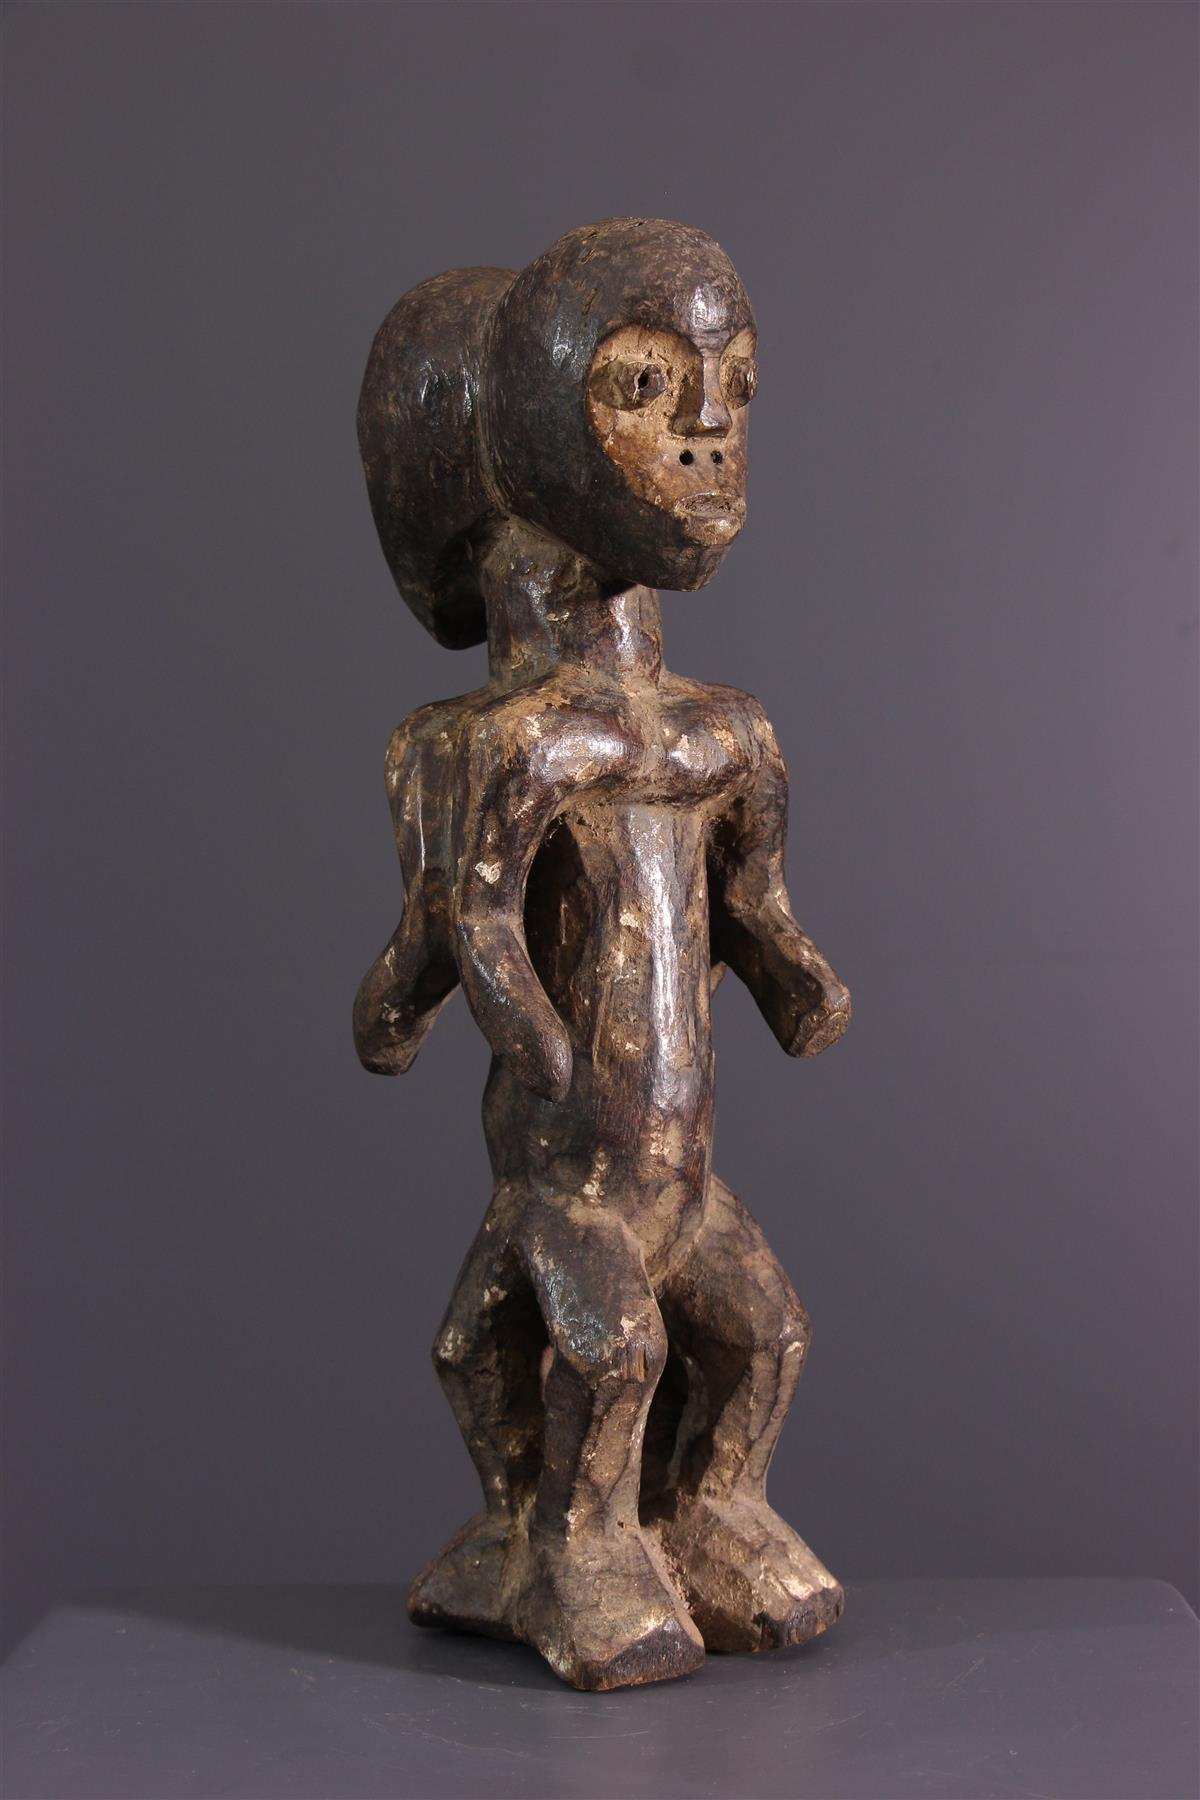 Figurine Lega - African art